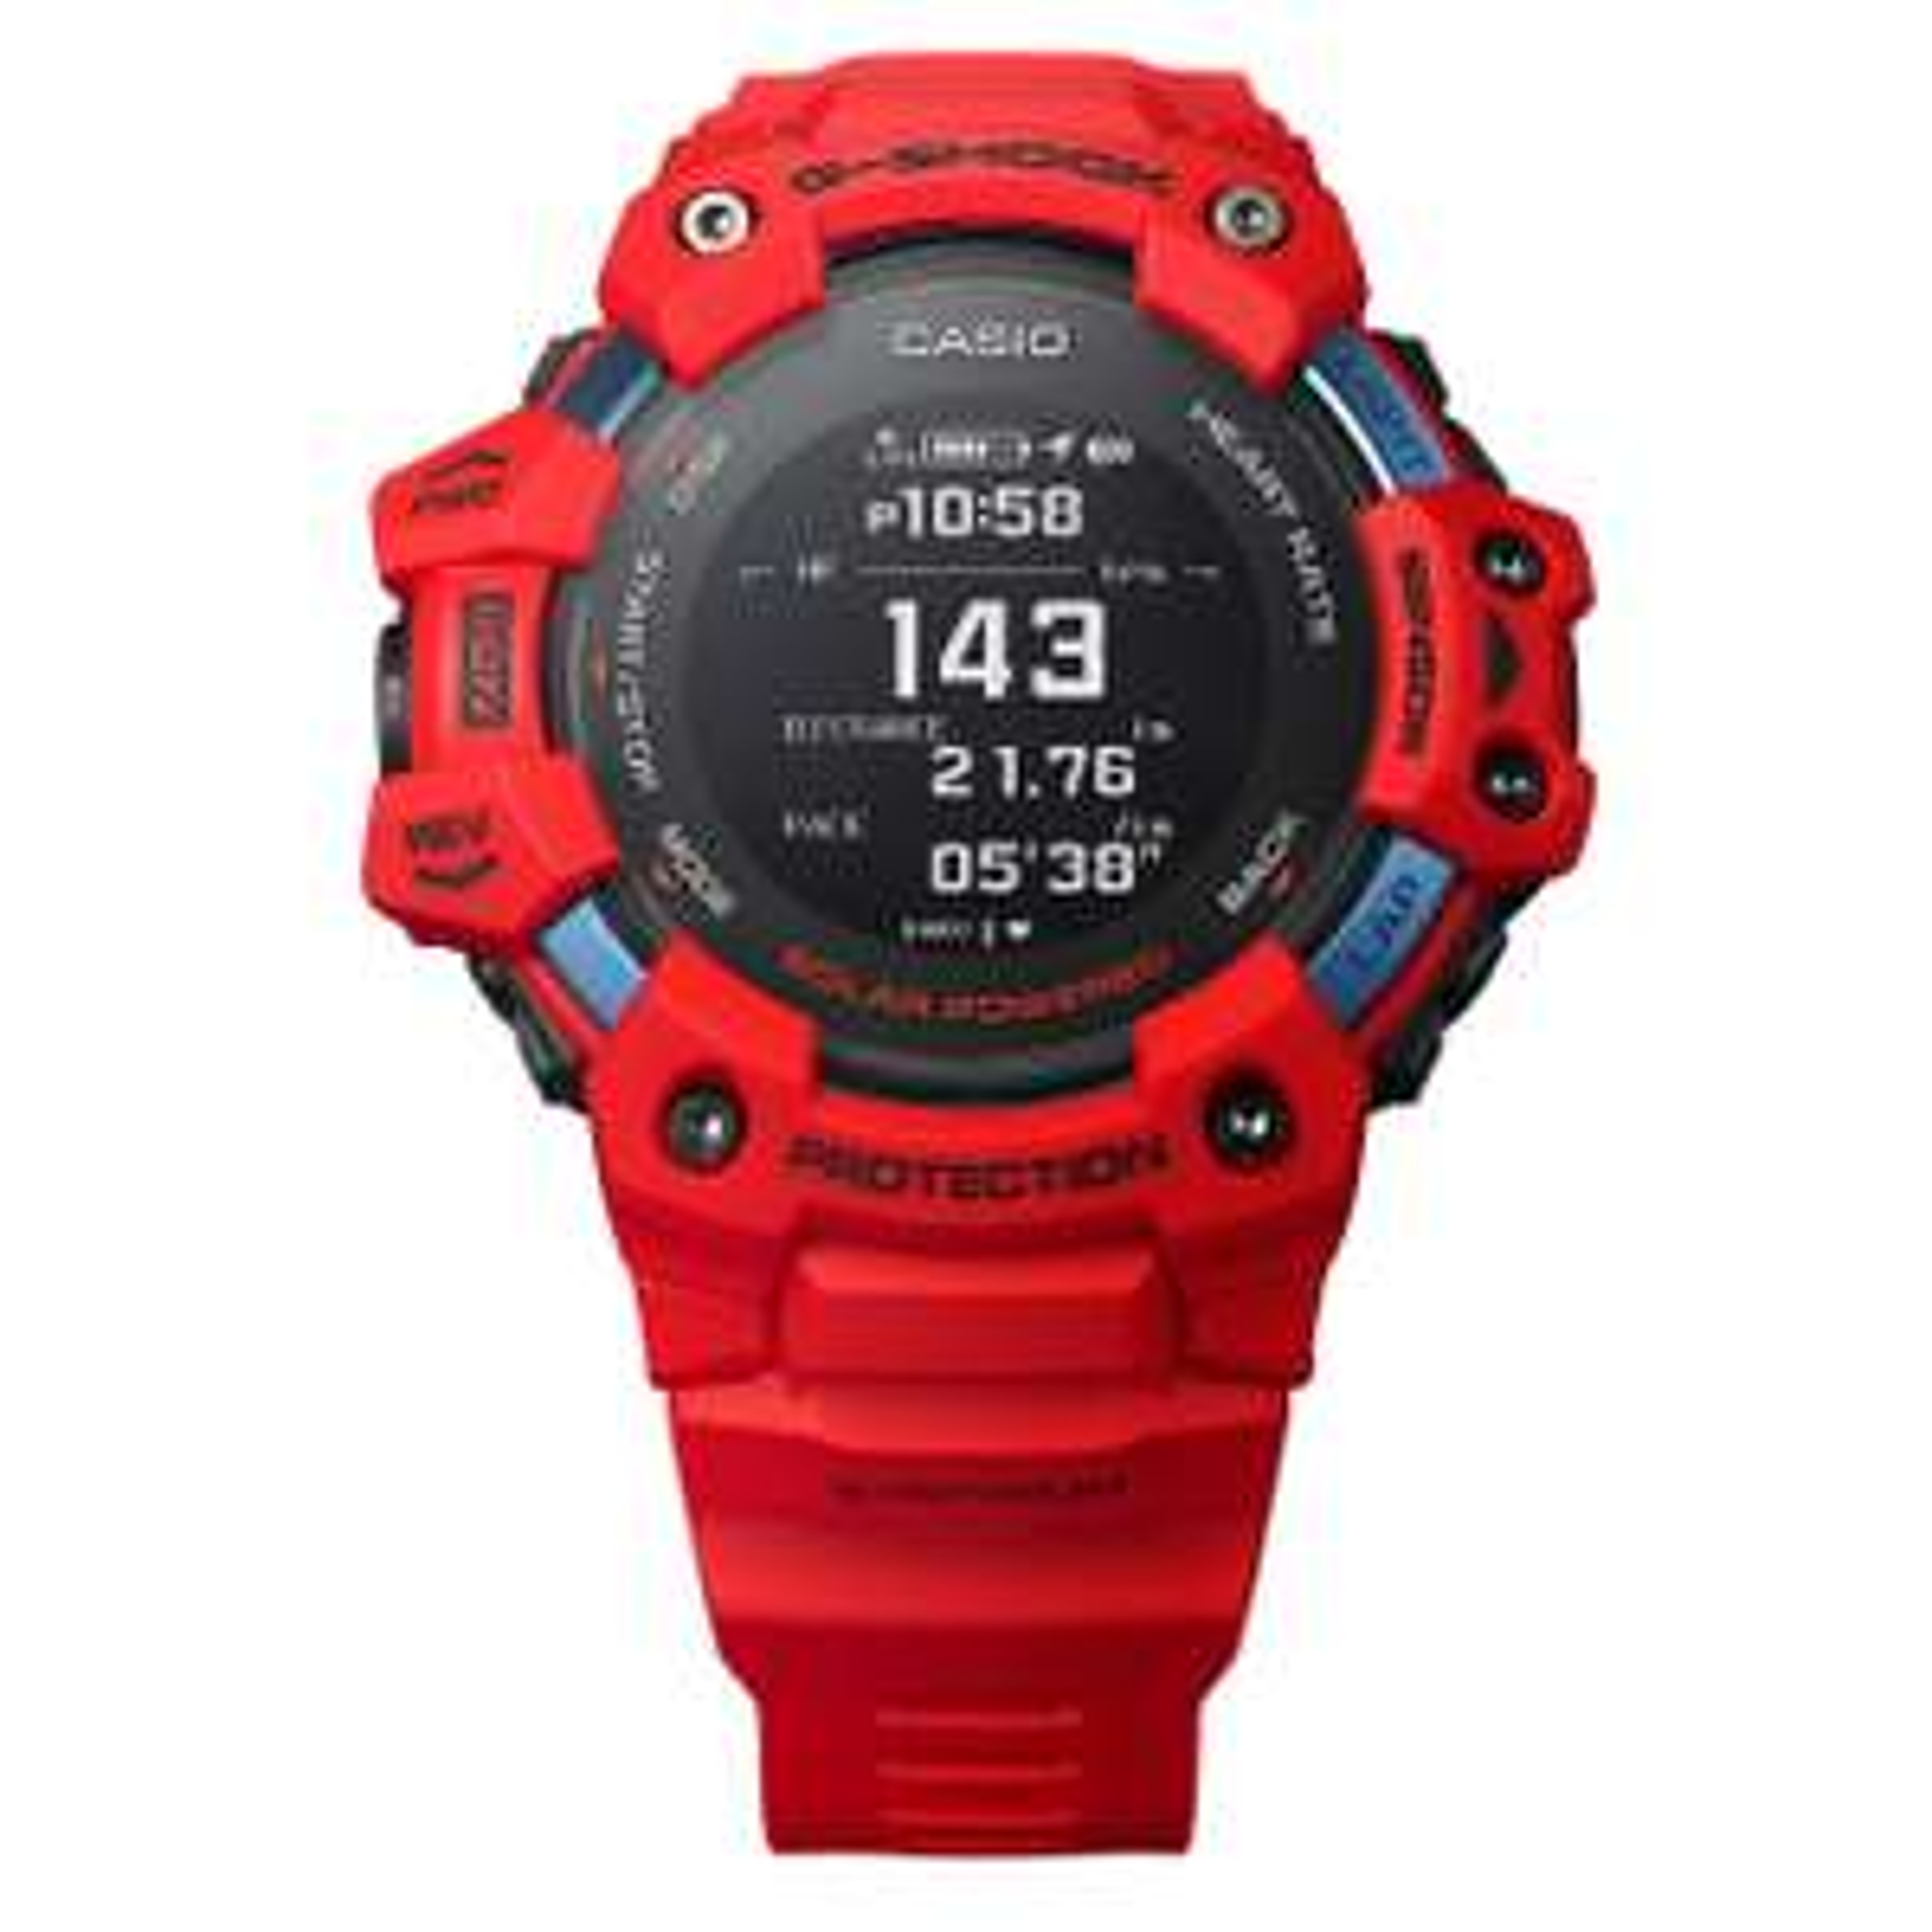 Casio G-Shock Heart Rate Monitor GBD-H1000-4ER - £305 @ Beaverbrooks